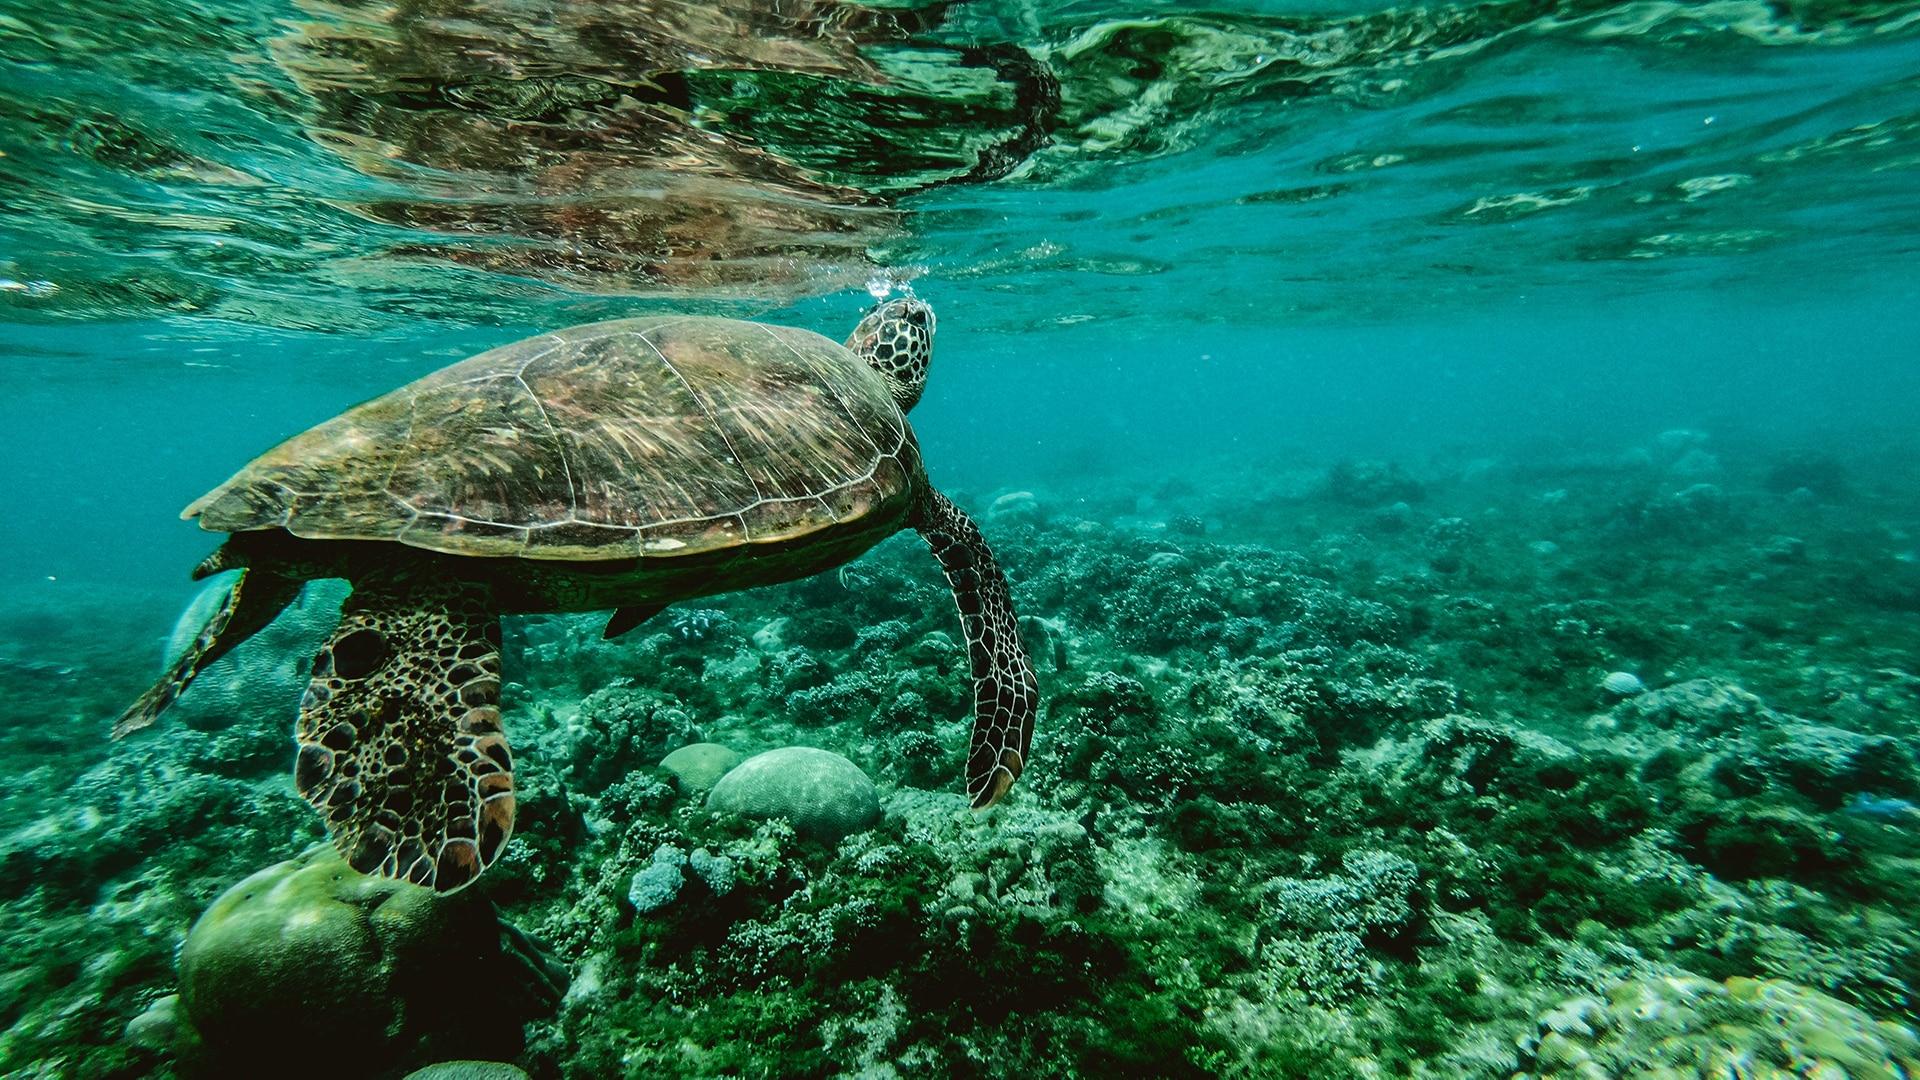 Sea turtle swims in the ocean